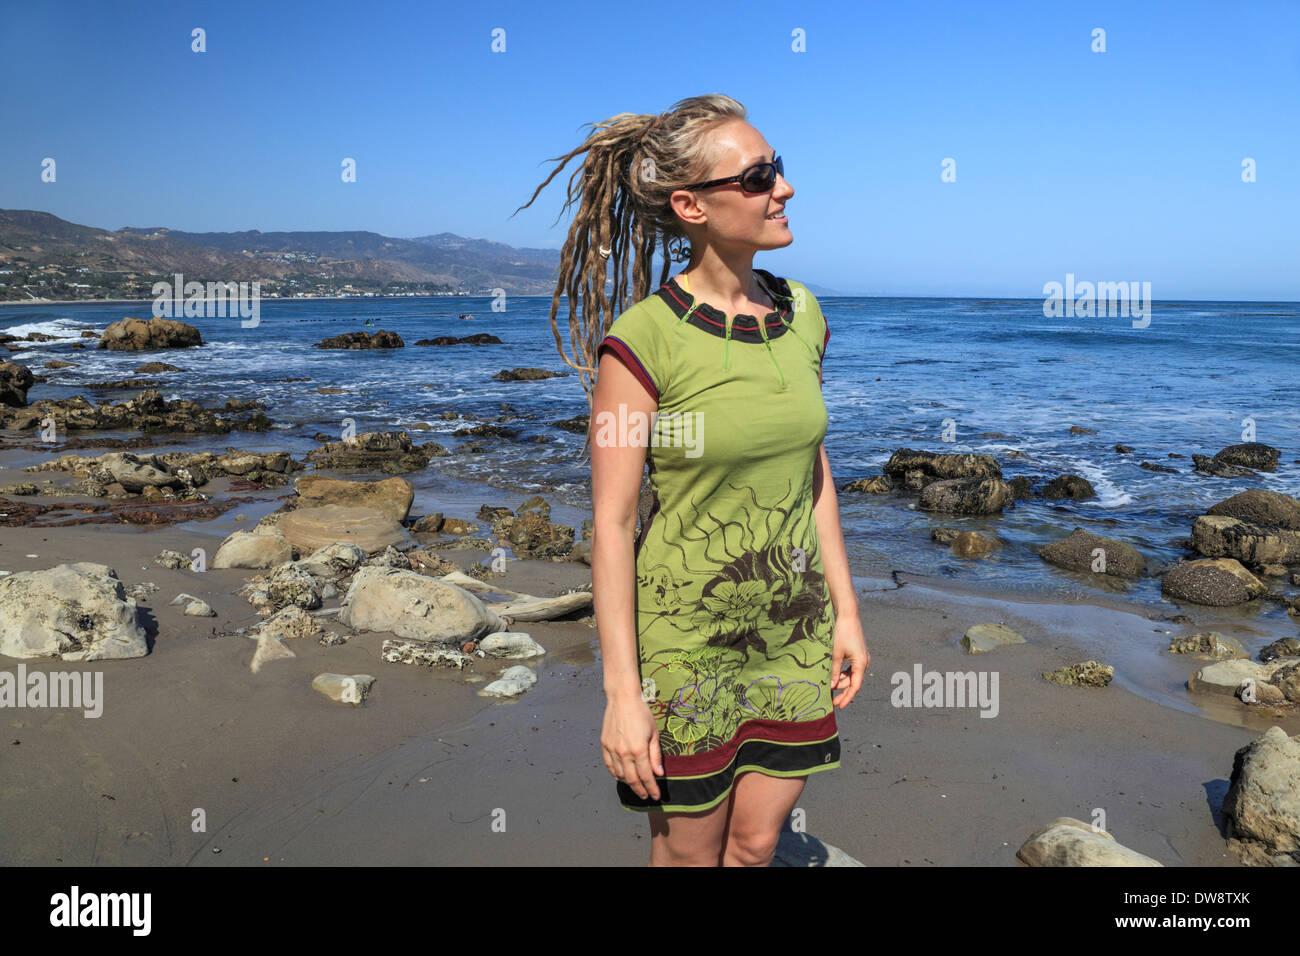 Besucher am Strand von PT Dume in Malibu Stockbild